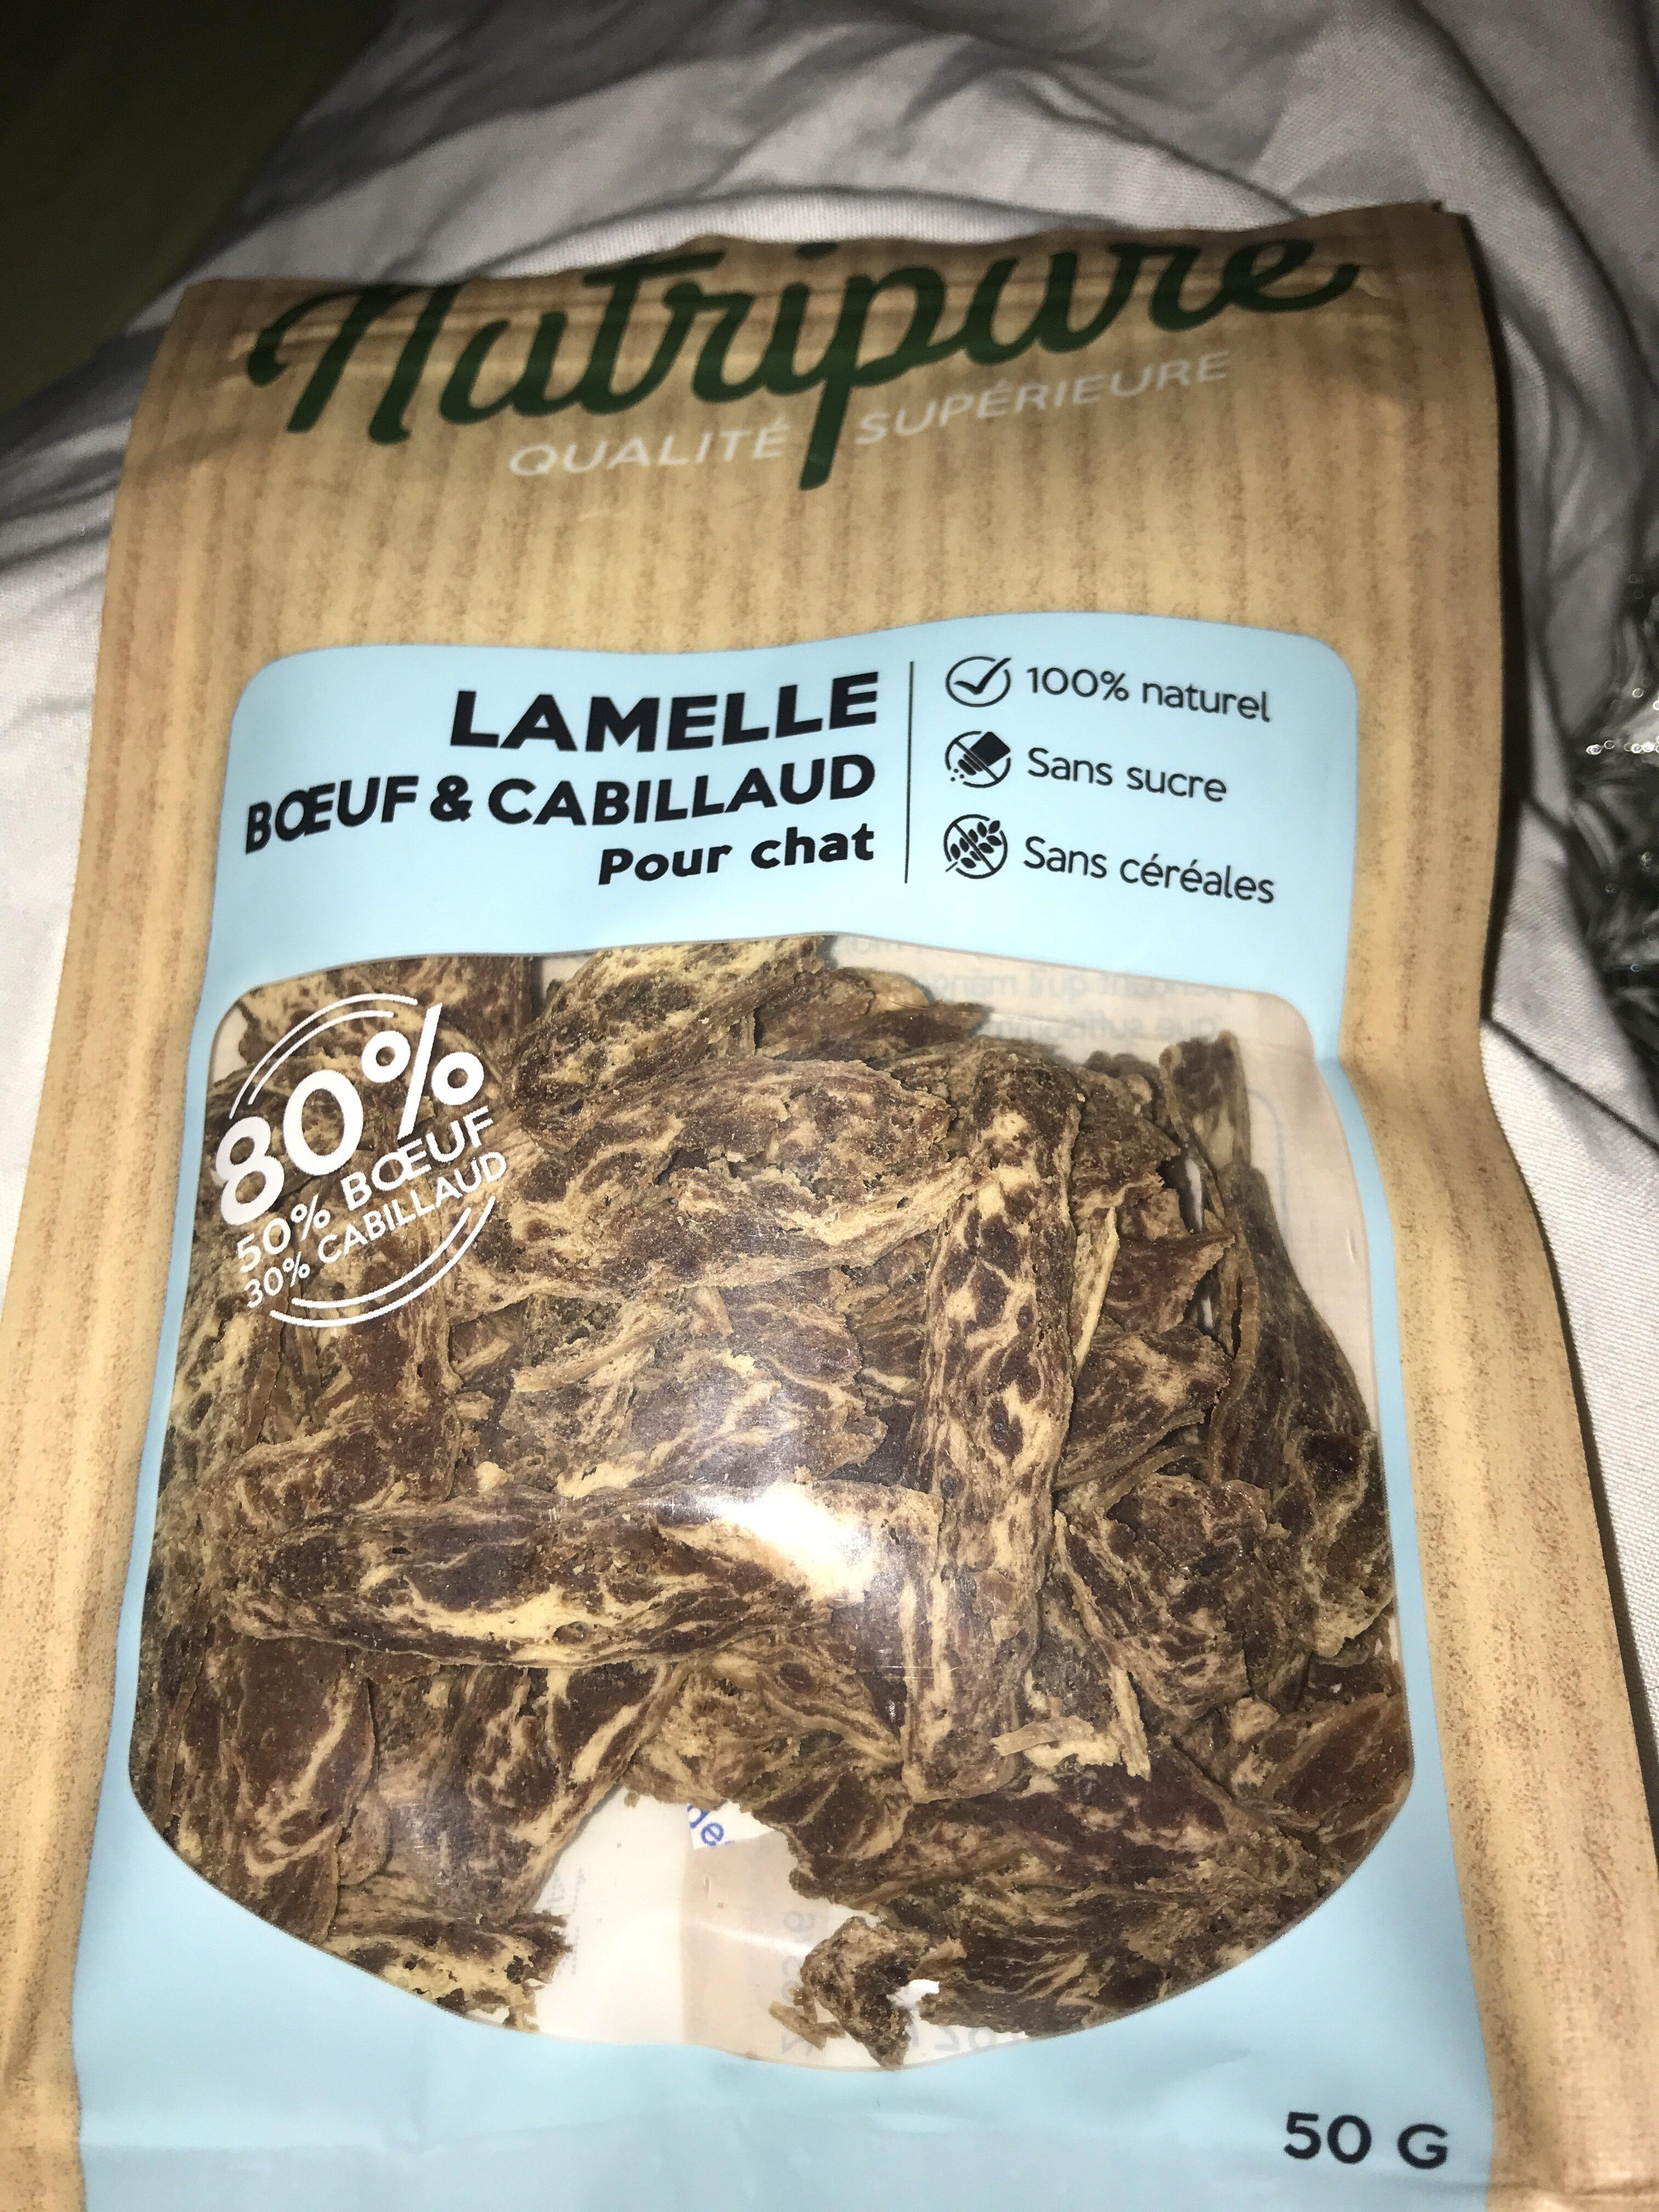 Lamelle bœuf & cabillaud - Product